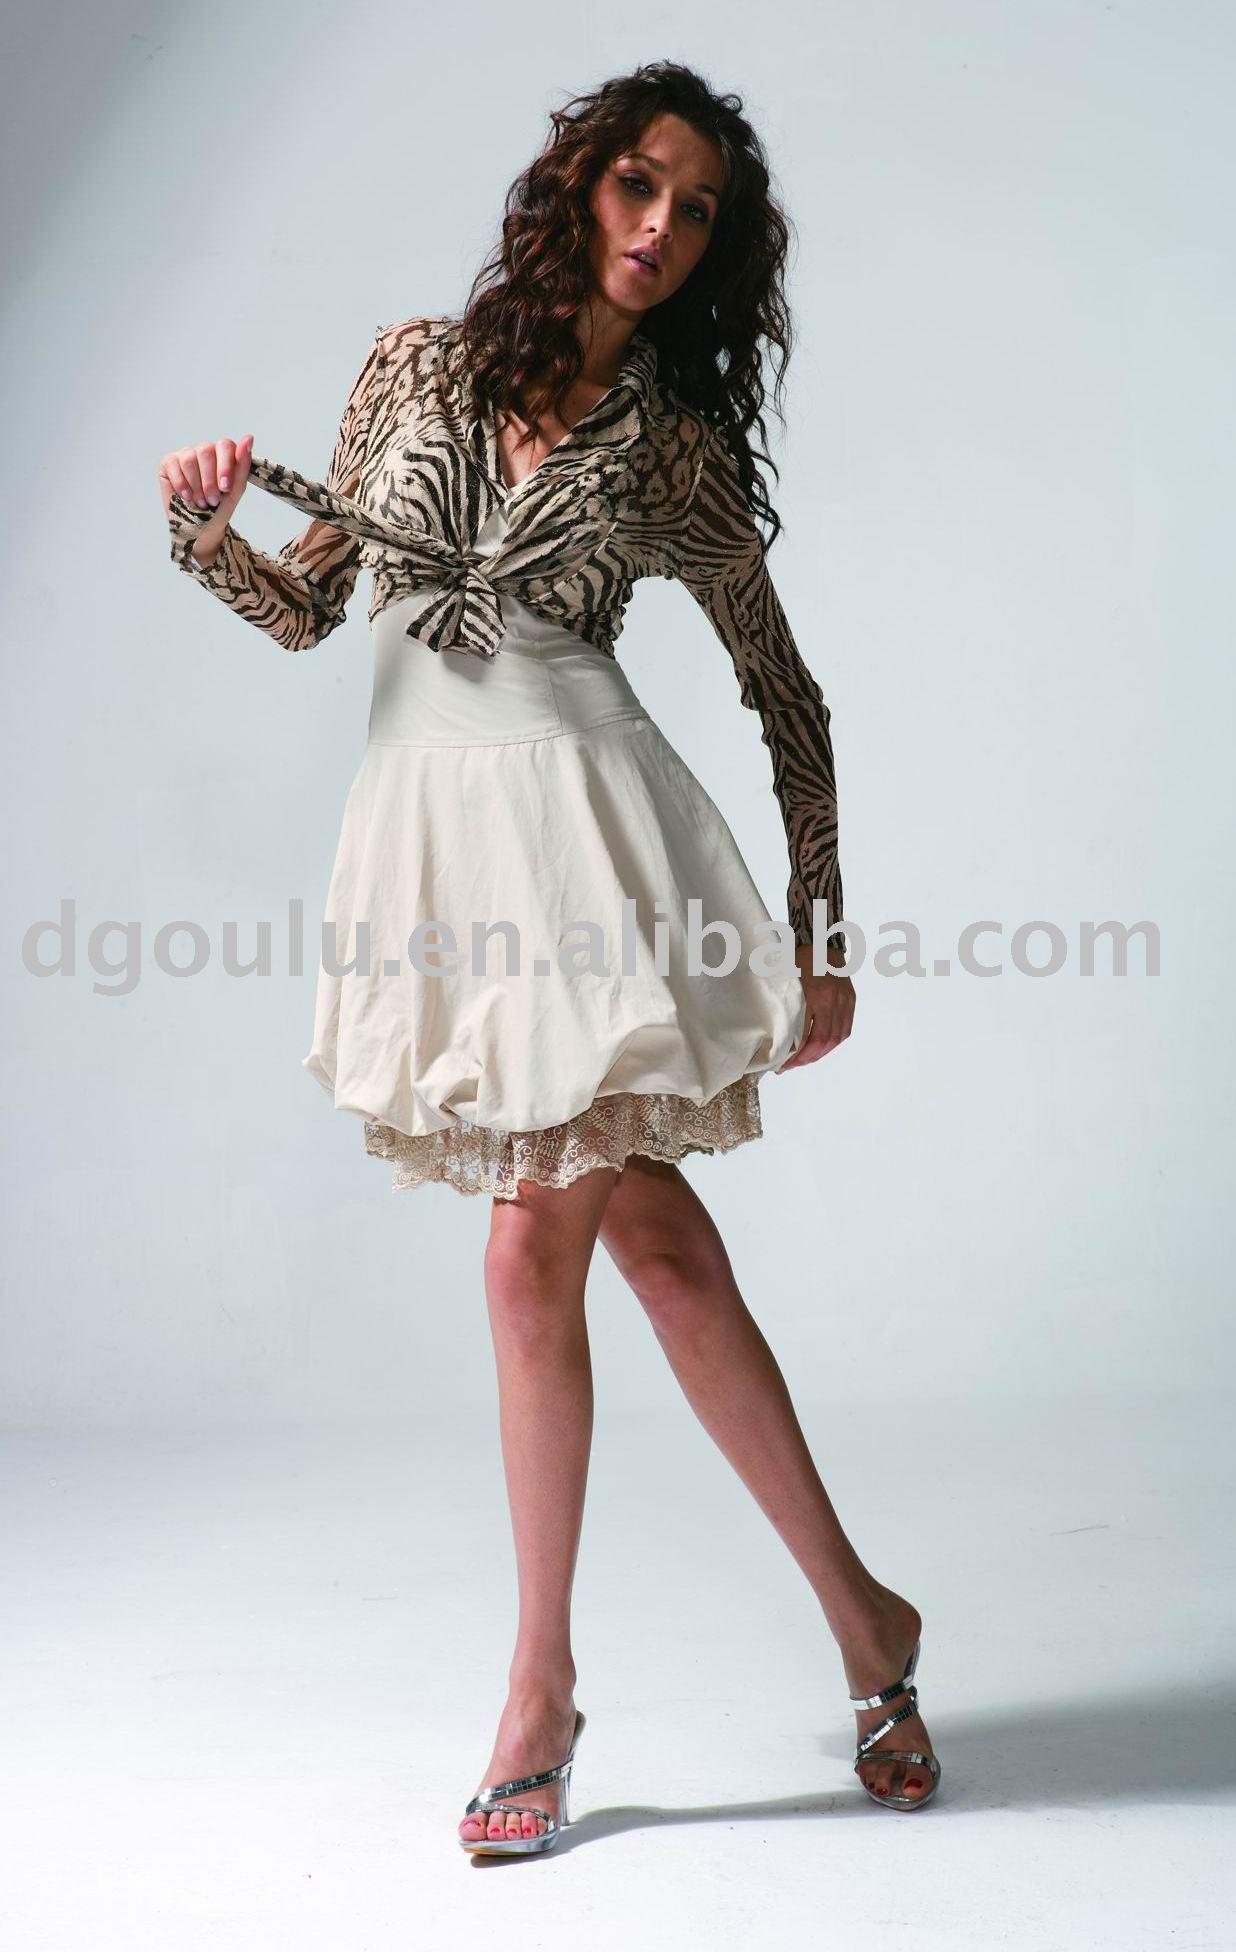 Fashion World: Fashion Clothing 2009